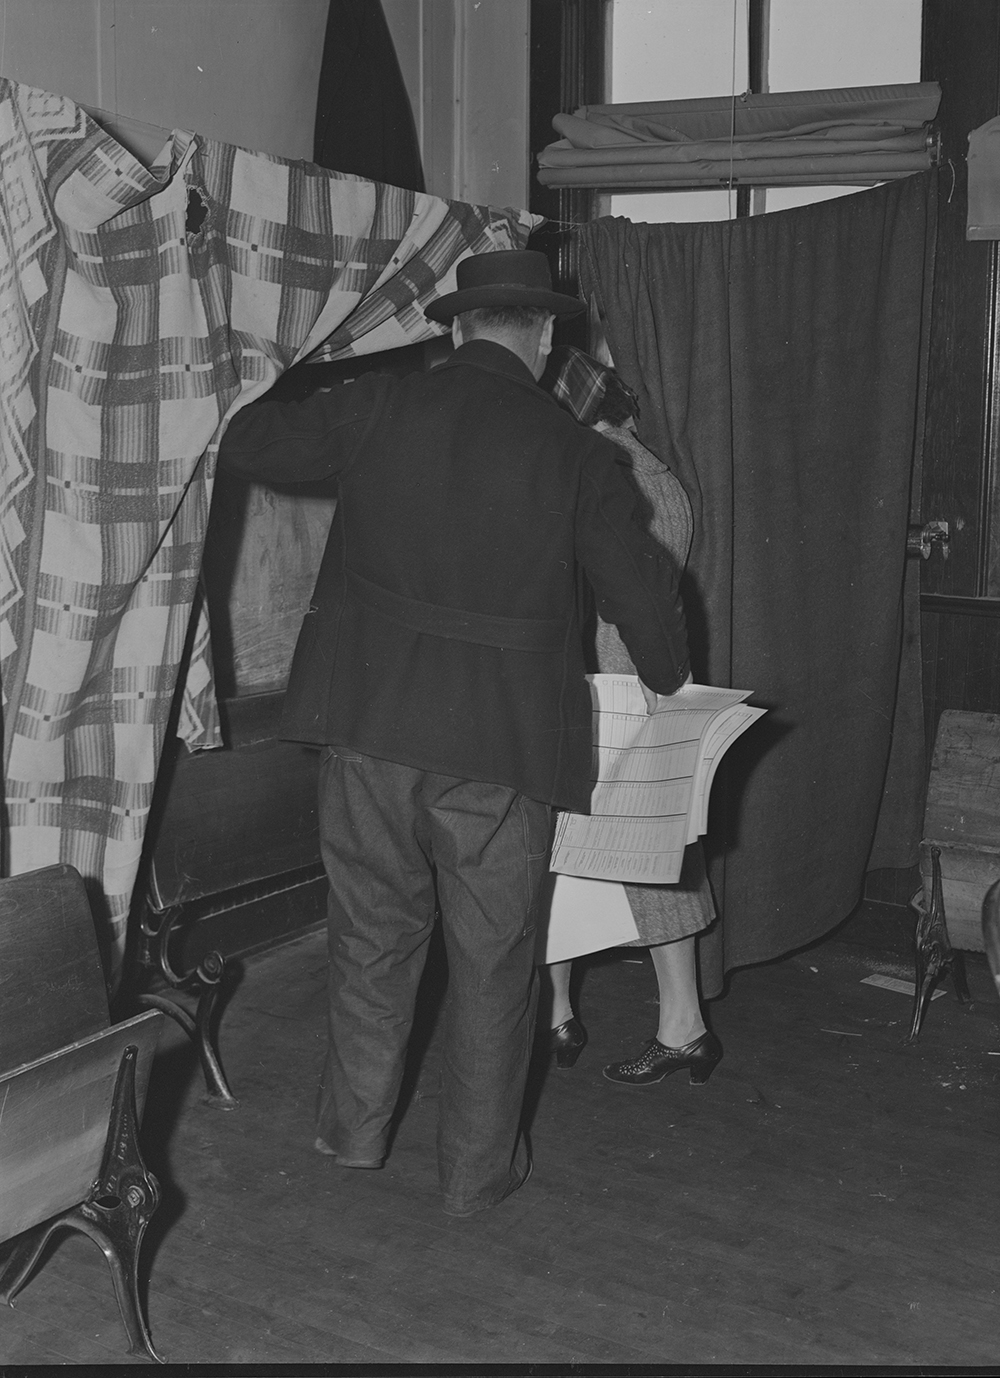 Election Day in McIntosh County, North Dakota, 1940. Photograph by John Vachon